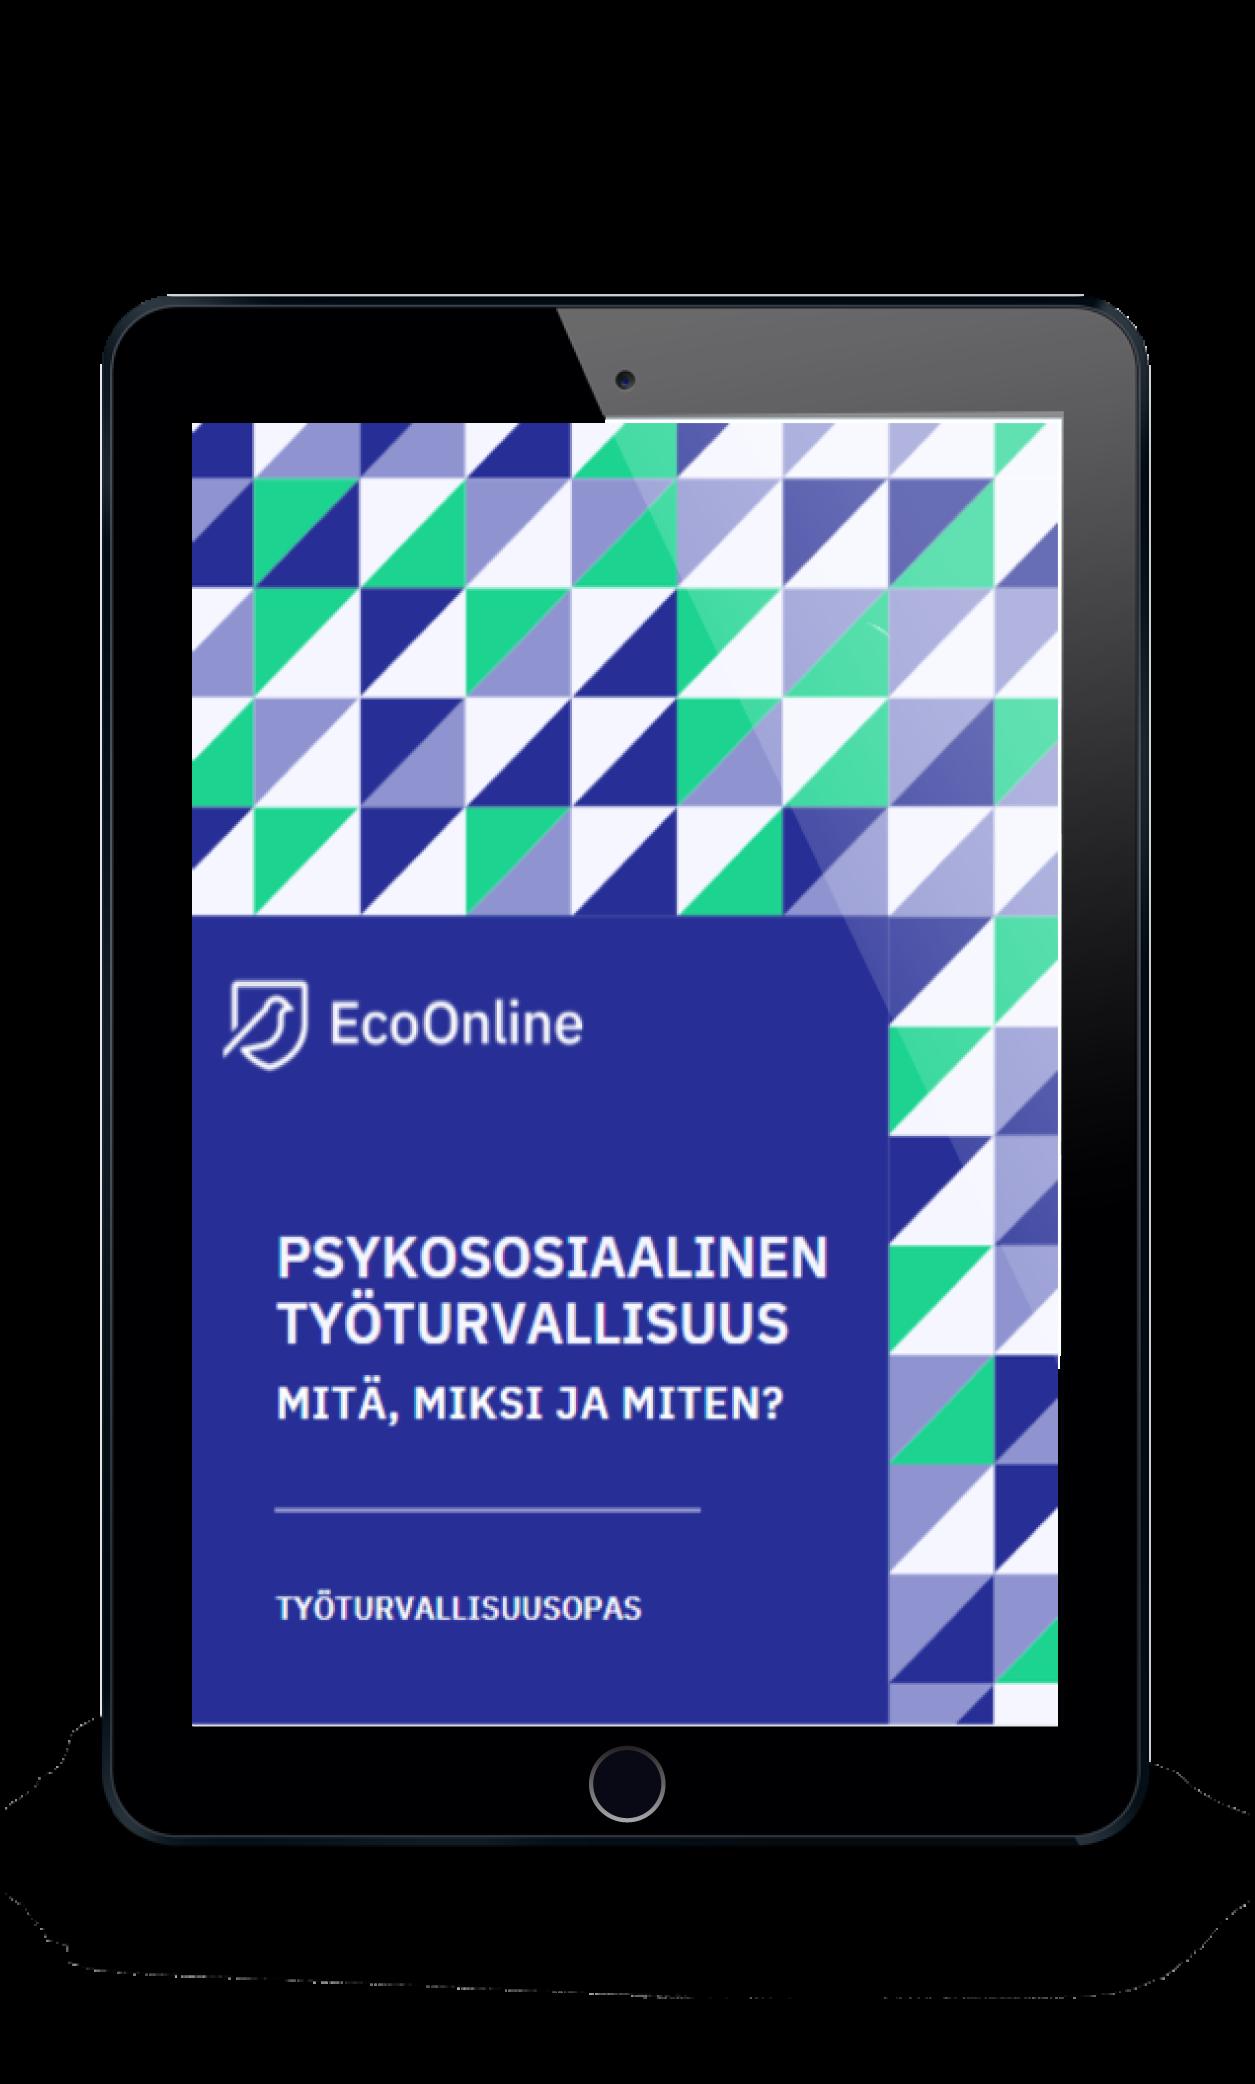 FI_Book Covers_Psykososiaalinen